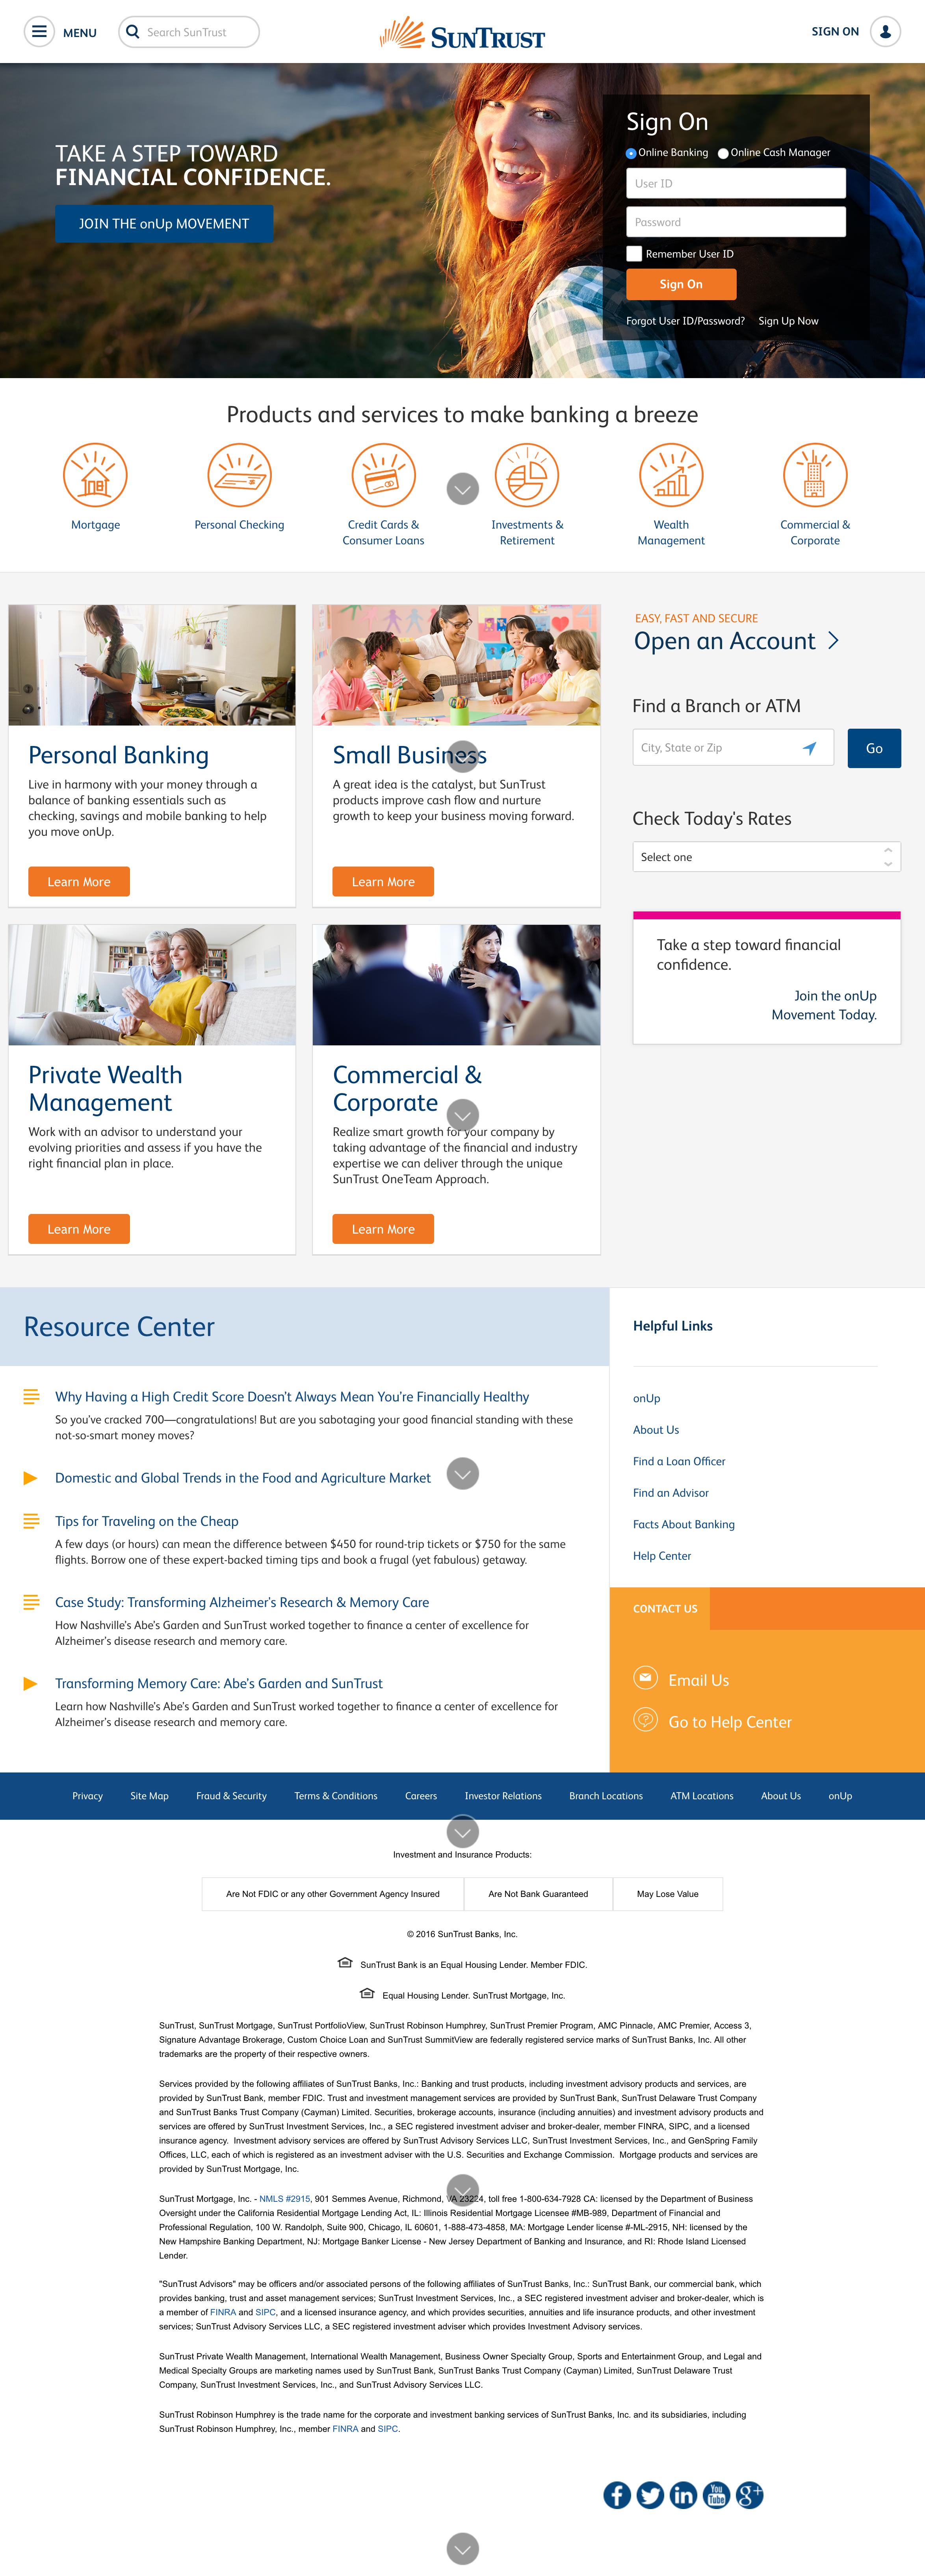 Suntrust Marketing Website Small Business Banking Banking Suntrust